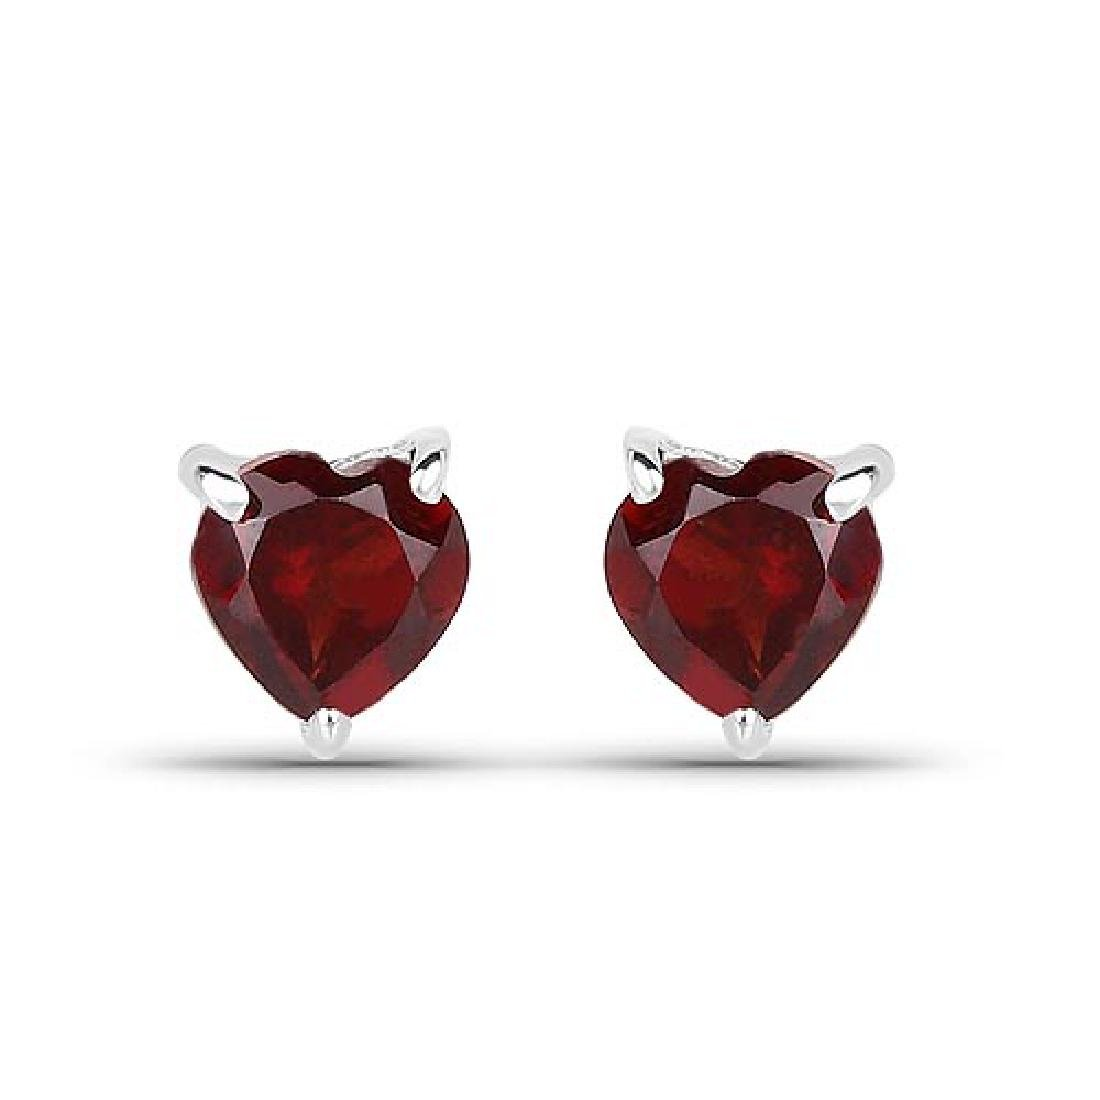 0.64 CTW Genuine Garnet .925 Sterling Silver Earrings